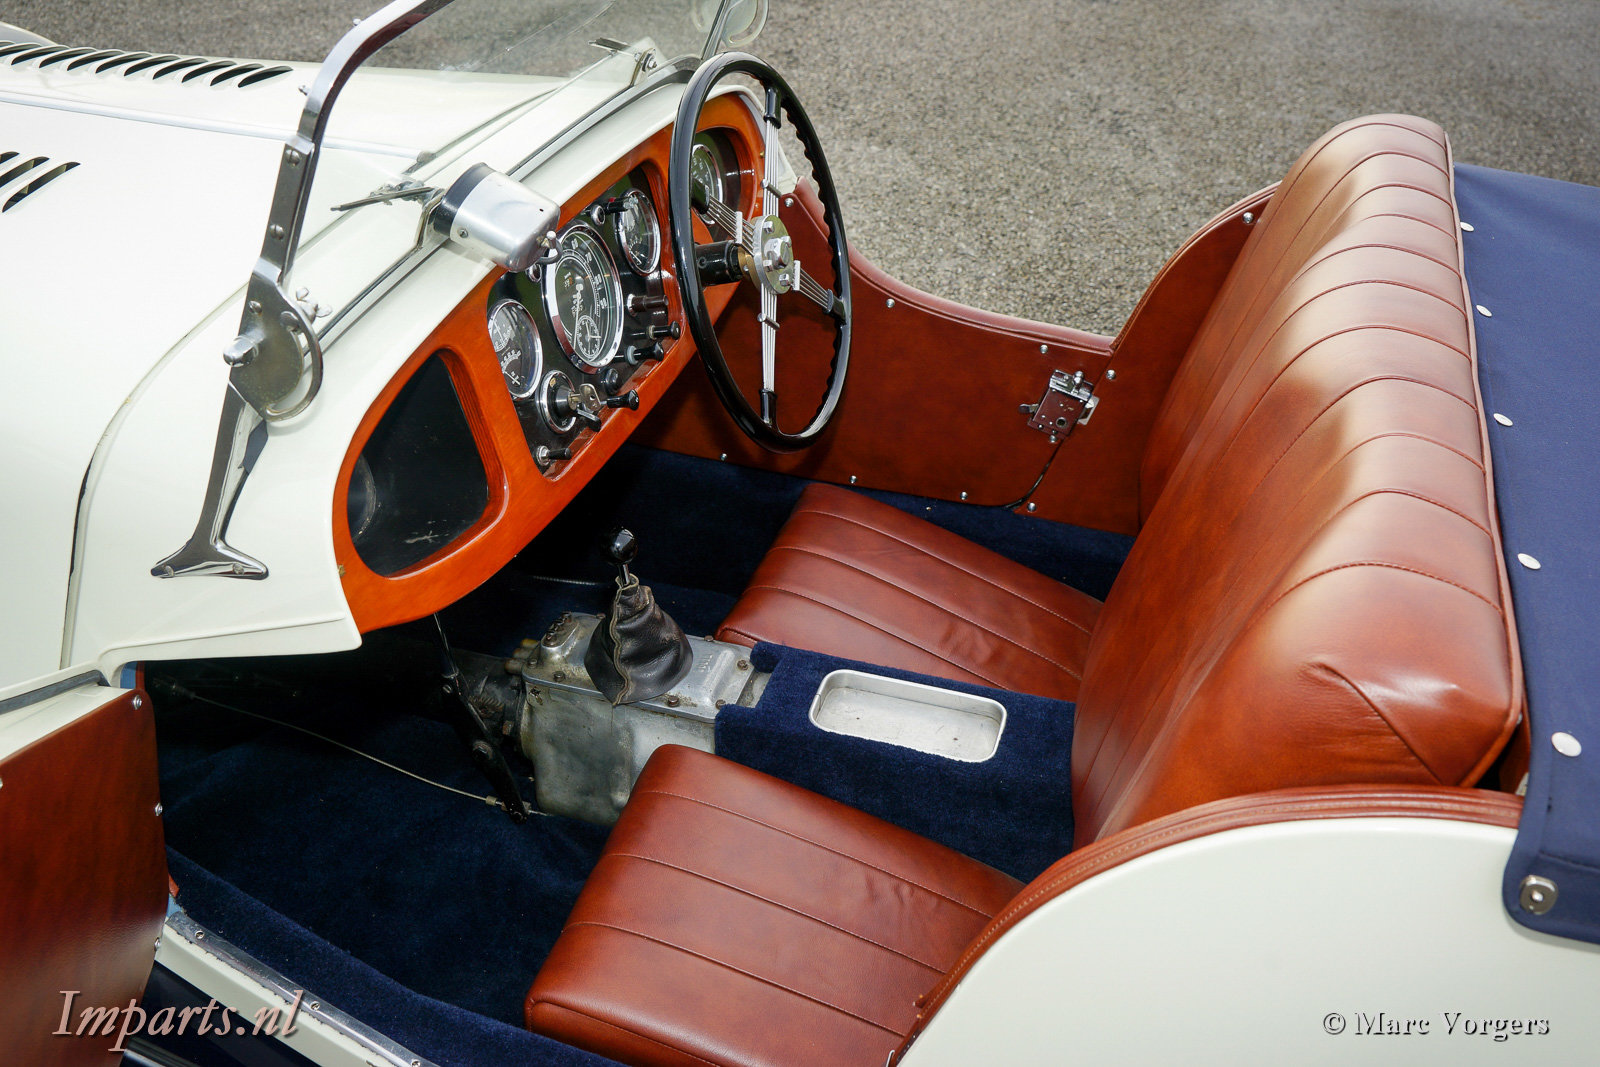 1946 Unique Morgan 4-4 Standrad Special 2 seater For Sale (picture 3 of 6)